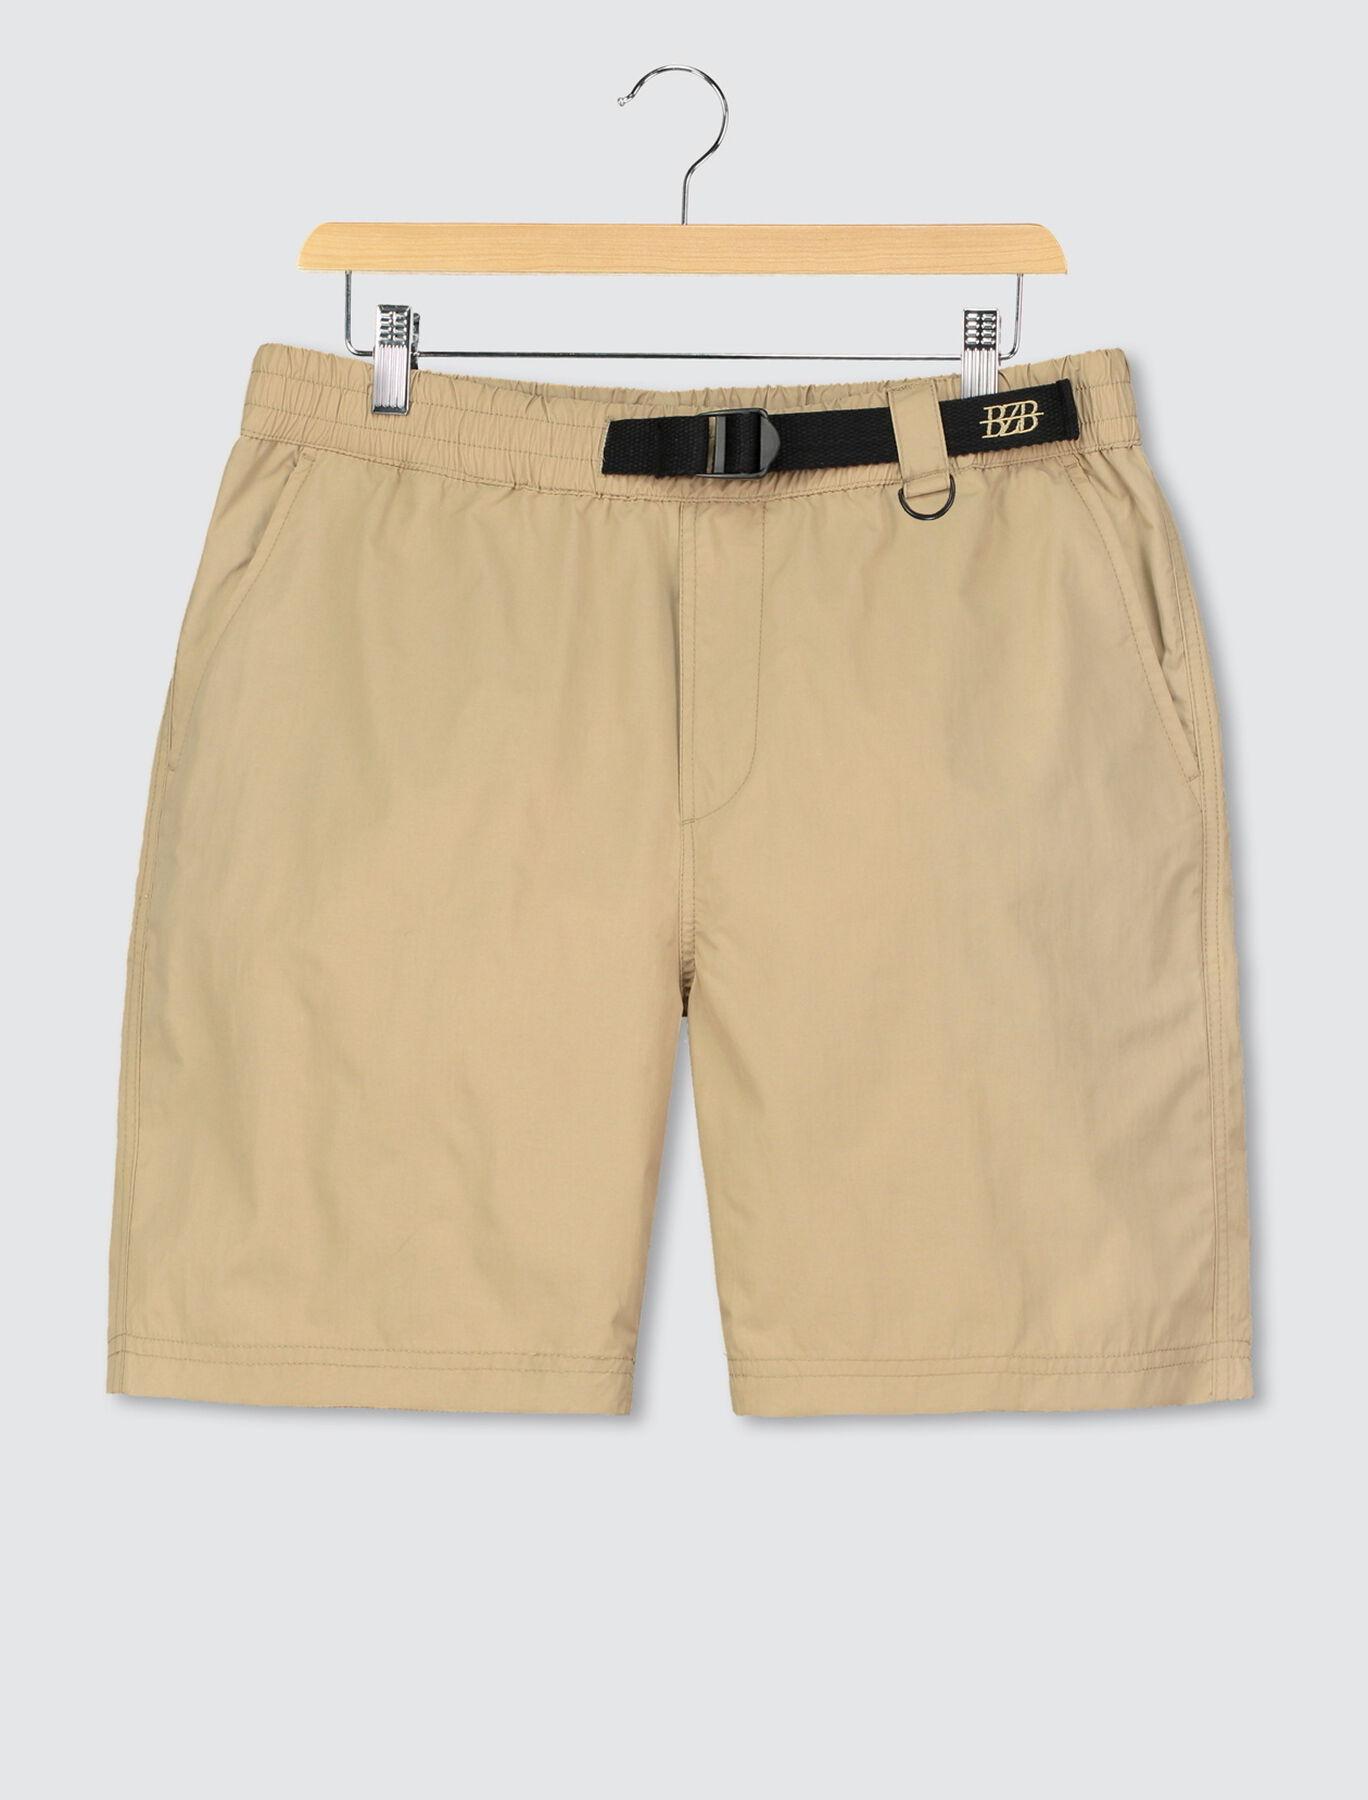 Bermuda beige technique